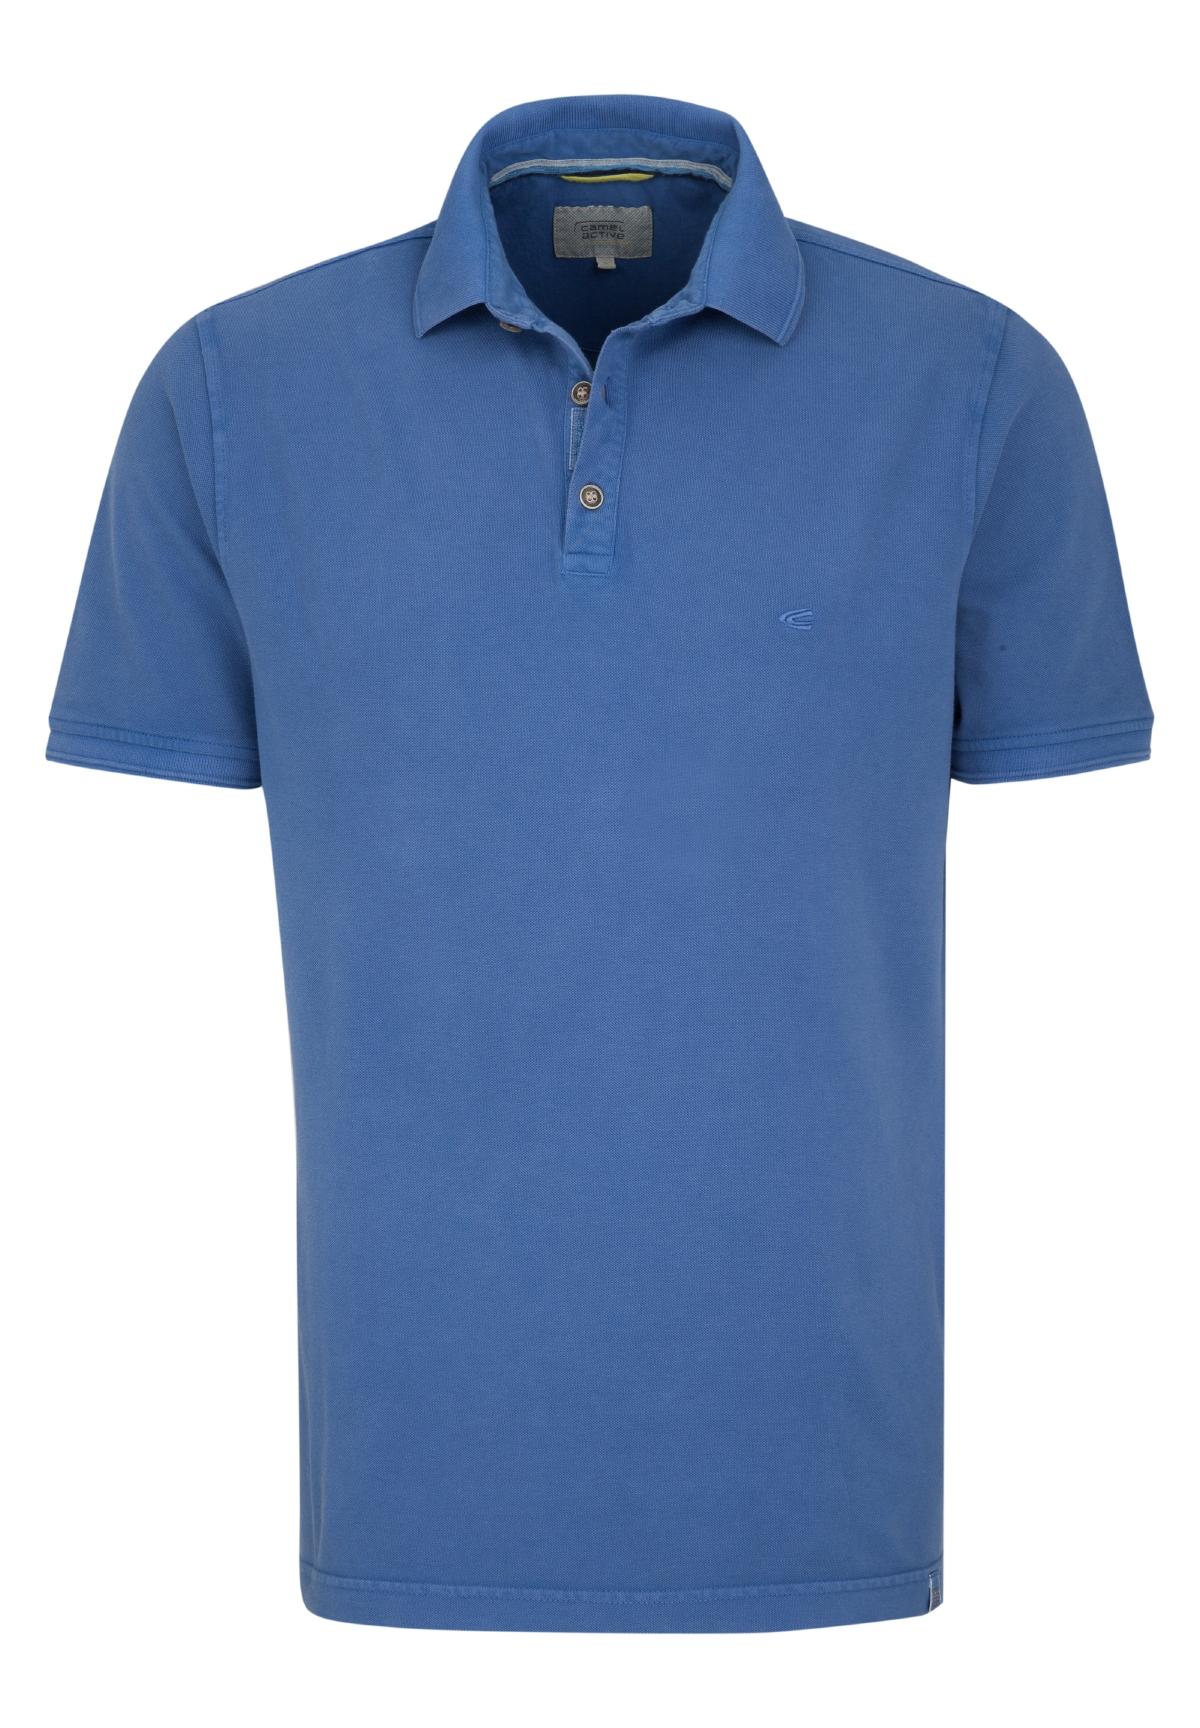 Camel-Active-Herren-Shirt-Poloshirt-Pique-Regular-Fit-NEU Indexbild 17